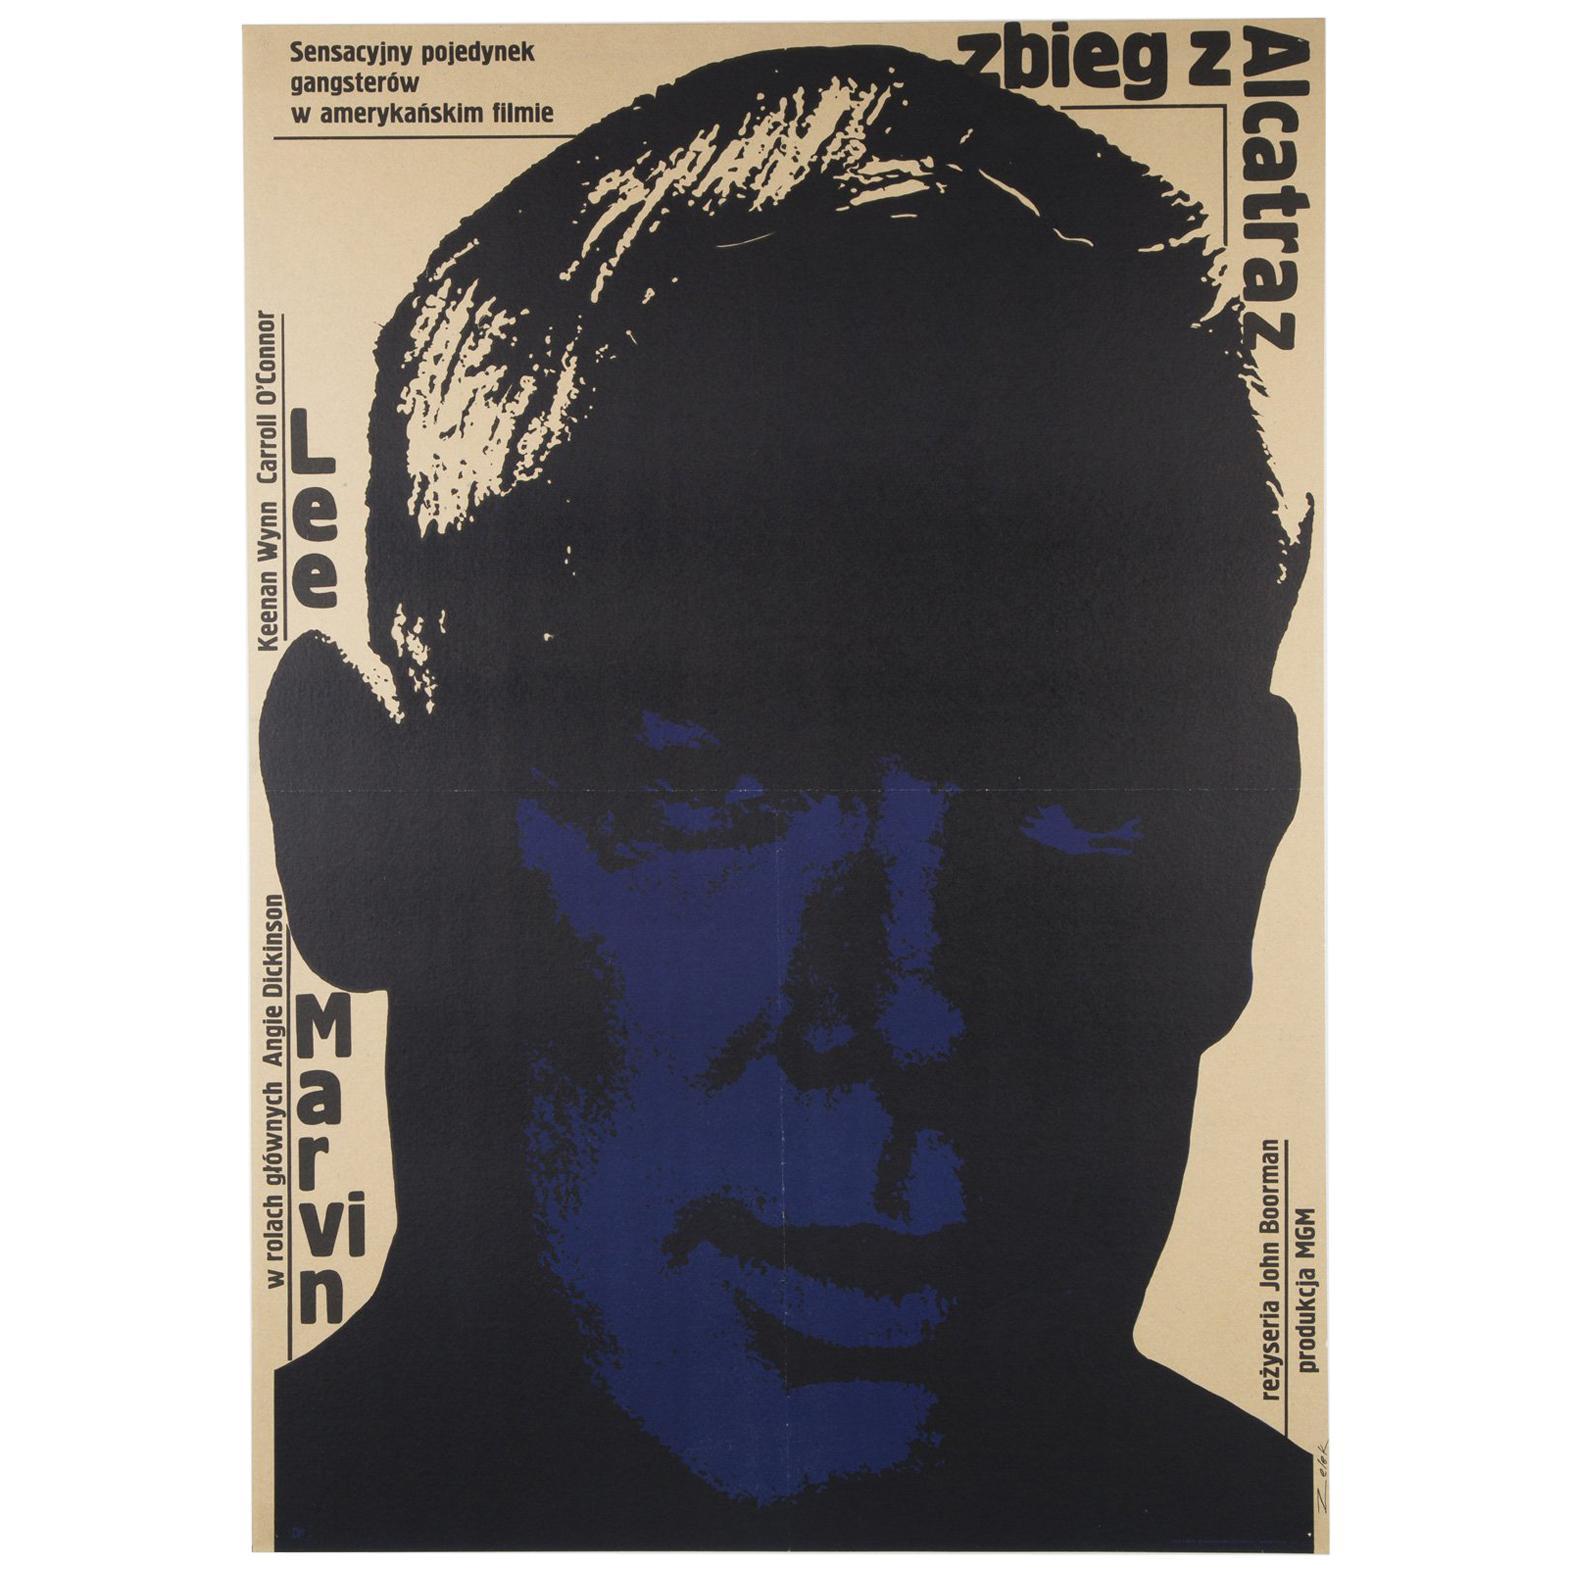 Point Blank Original Polish Film Poster, Bronislaw Zelek, 1970